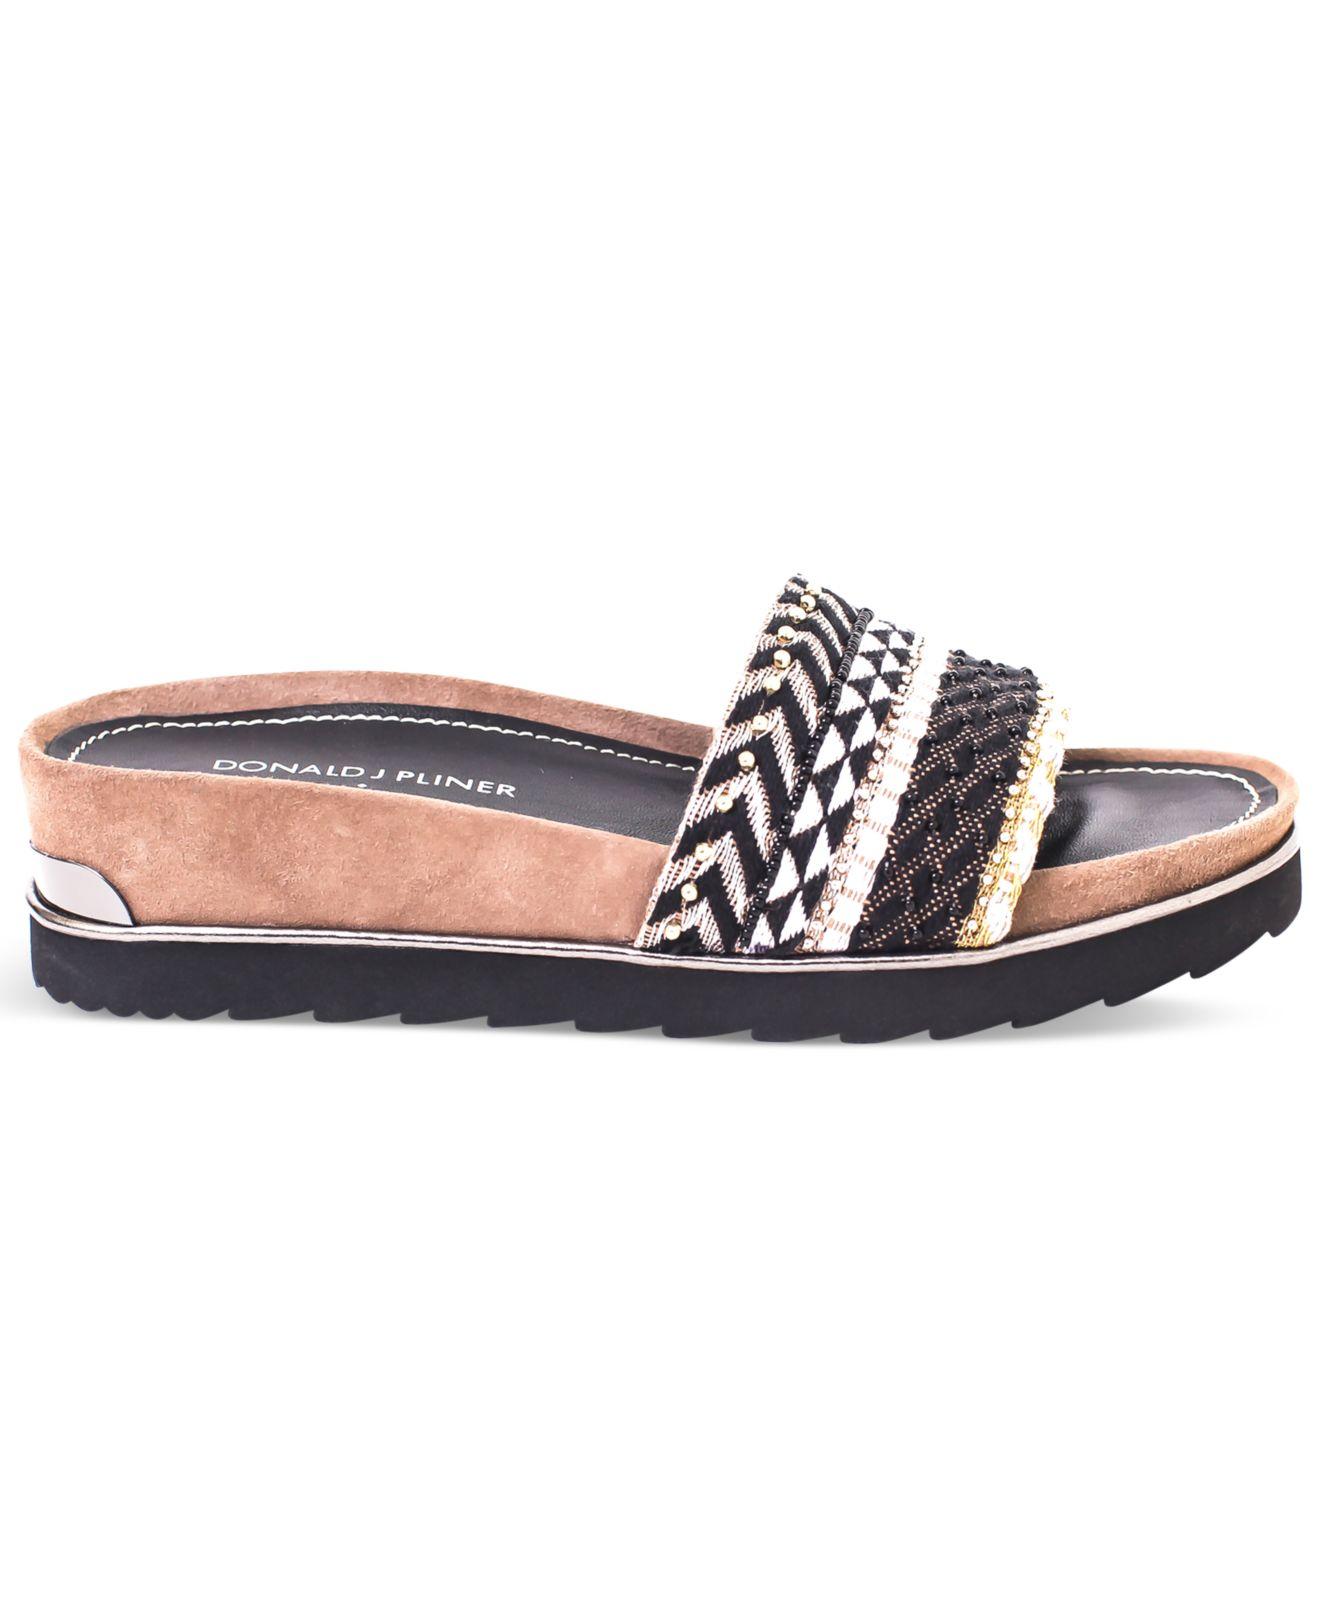 912a0e1e176 Lyst donald pliner donald pliner cava slide on wedge sandals jpg 1320x1616 Donald  pliner slides